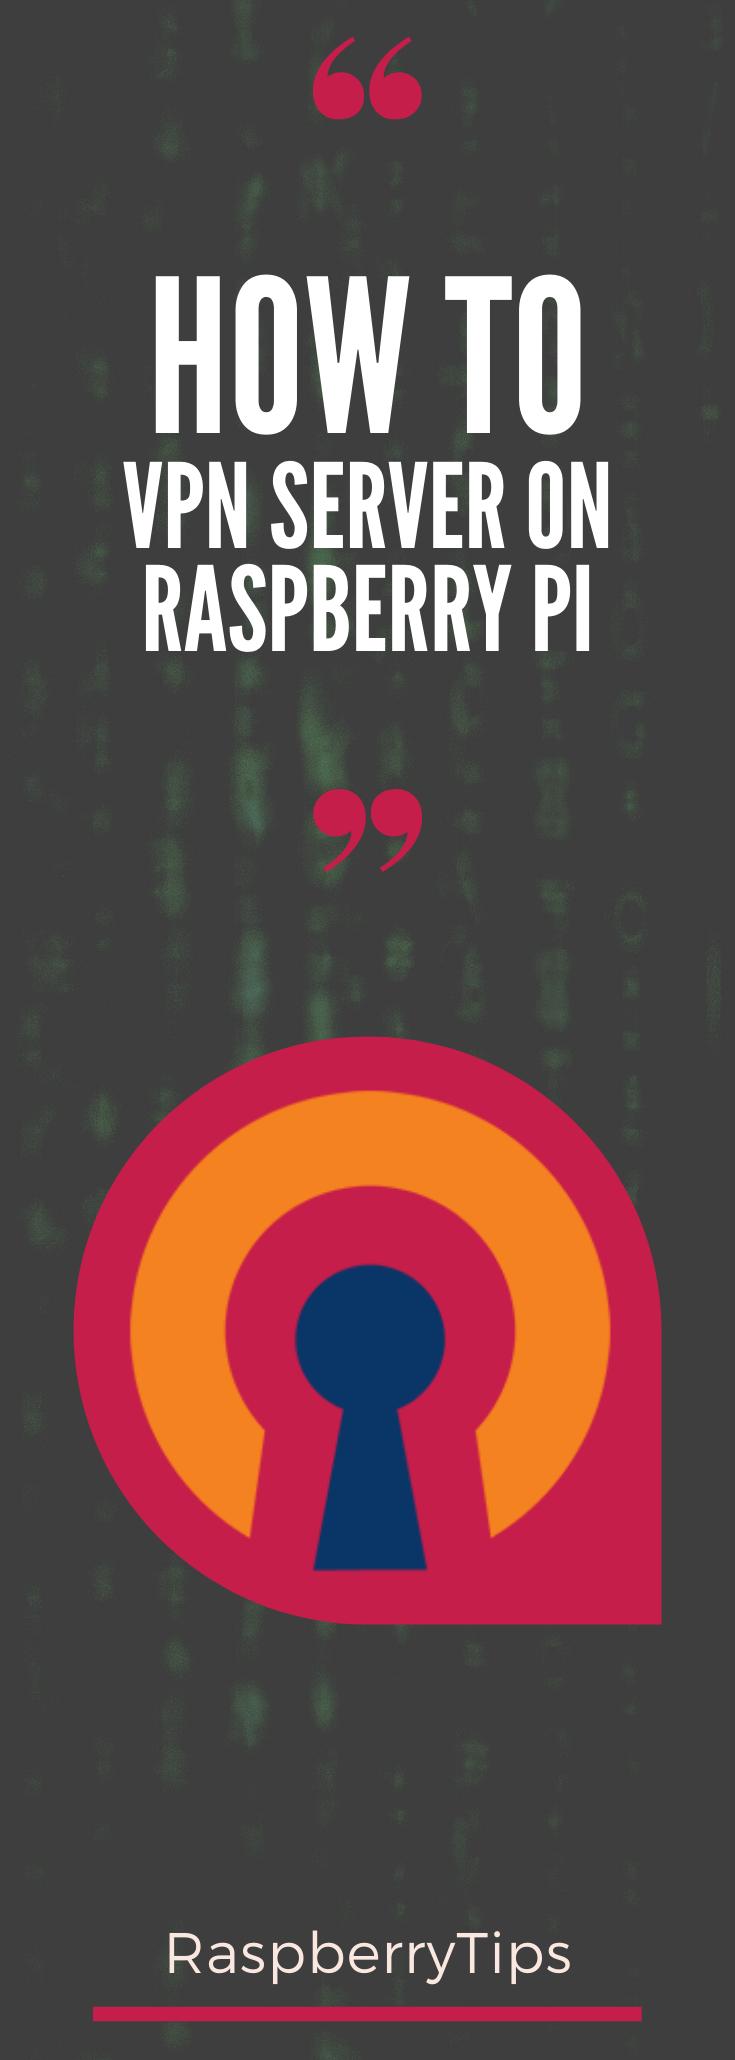 ca62921c8cd89c6276a68e1bdaa57ed1 - Install Vpn Server On Raspberry Pi